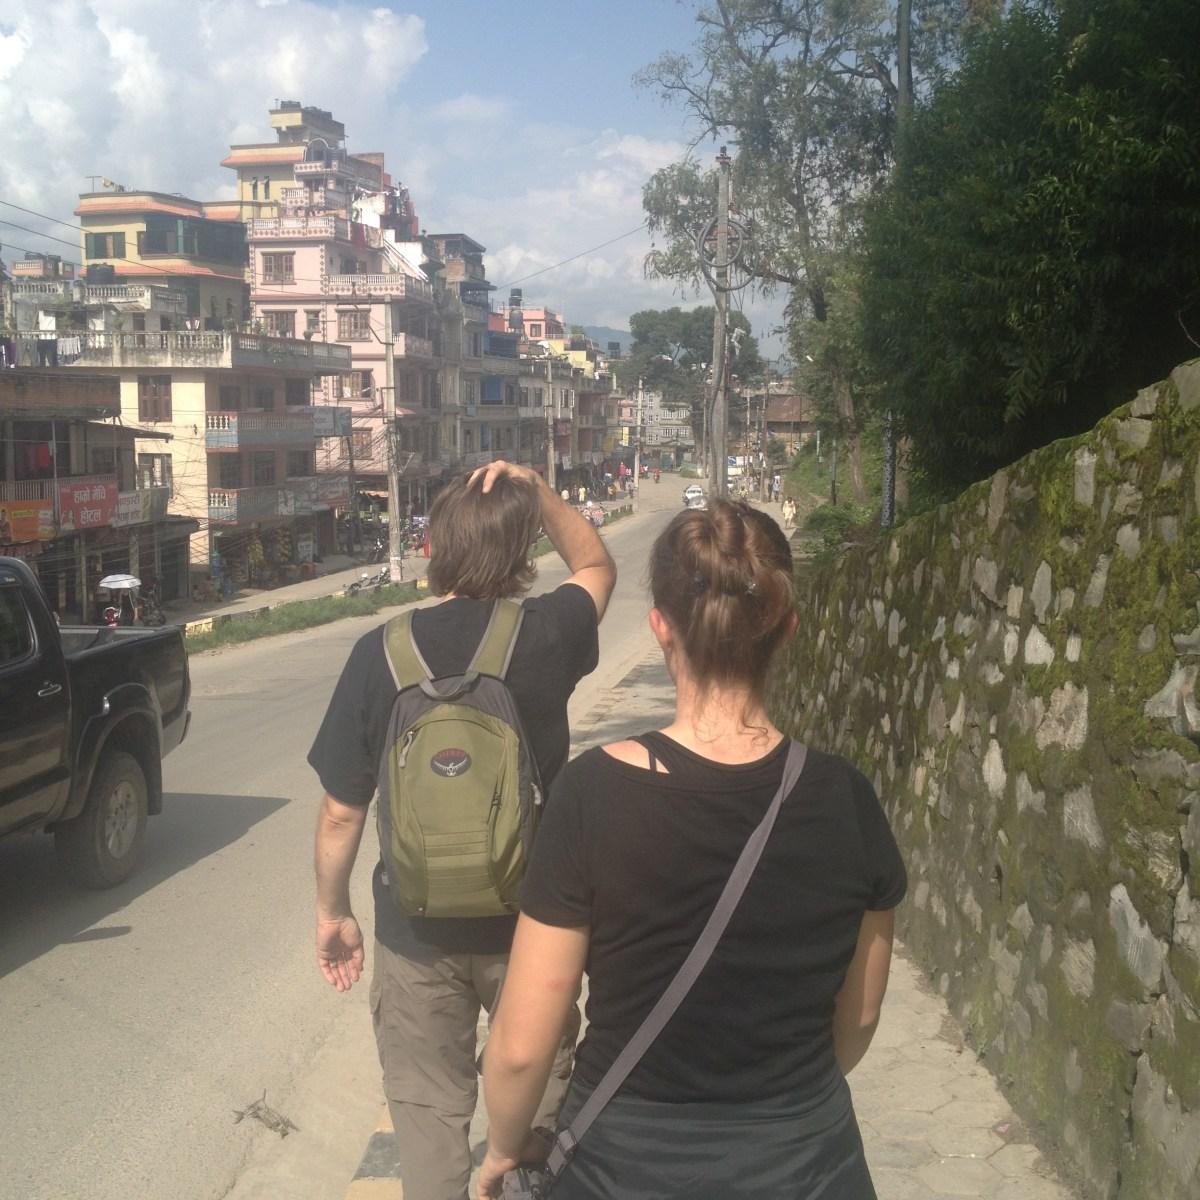 Kathmandu Tourism: Walking to Boudhanath Temple from Pashupatinath